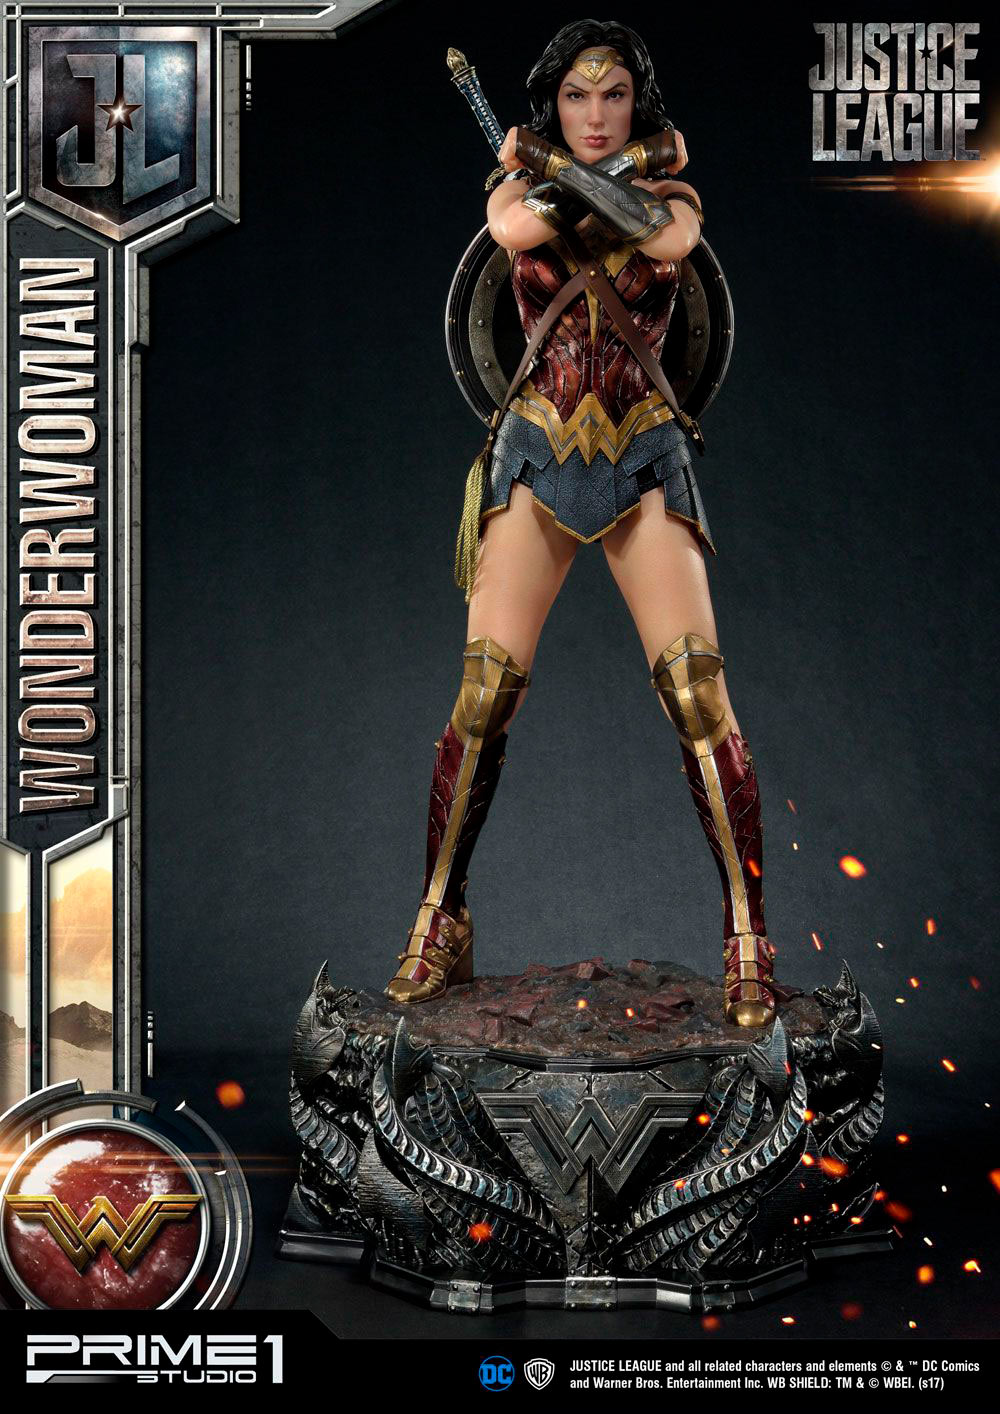 Estatua Wonder Woman 85 cm. La Liga de la Justicia. Con luz. DC Cómics. Prime 1 Studio